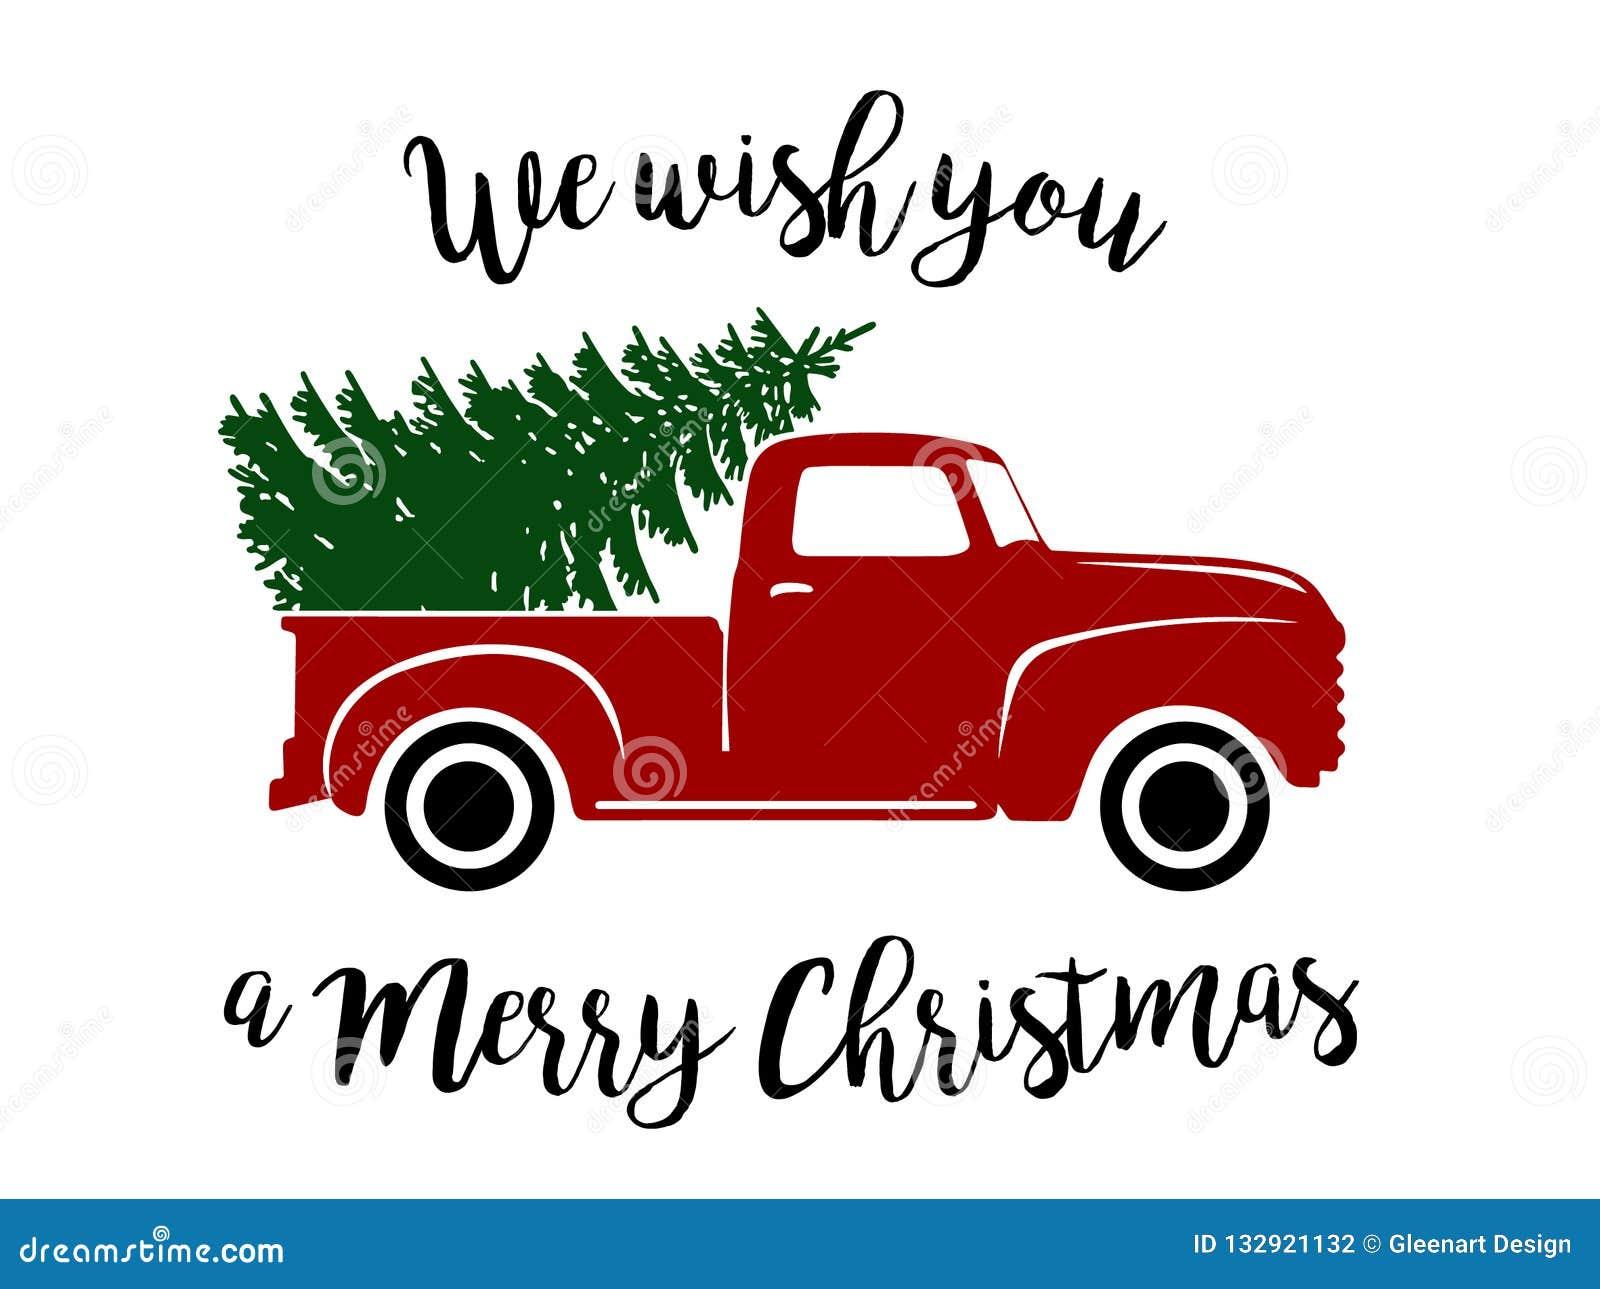 Old Christmas Truck Stock Vector Illustration Of Artwork 132921132